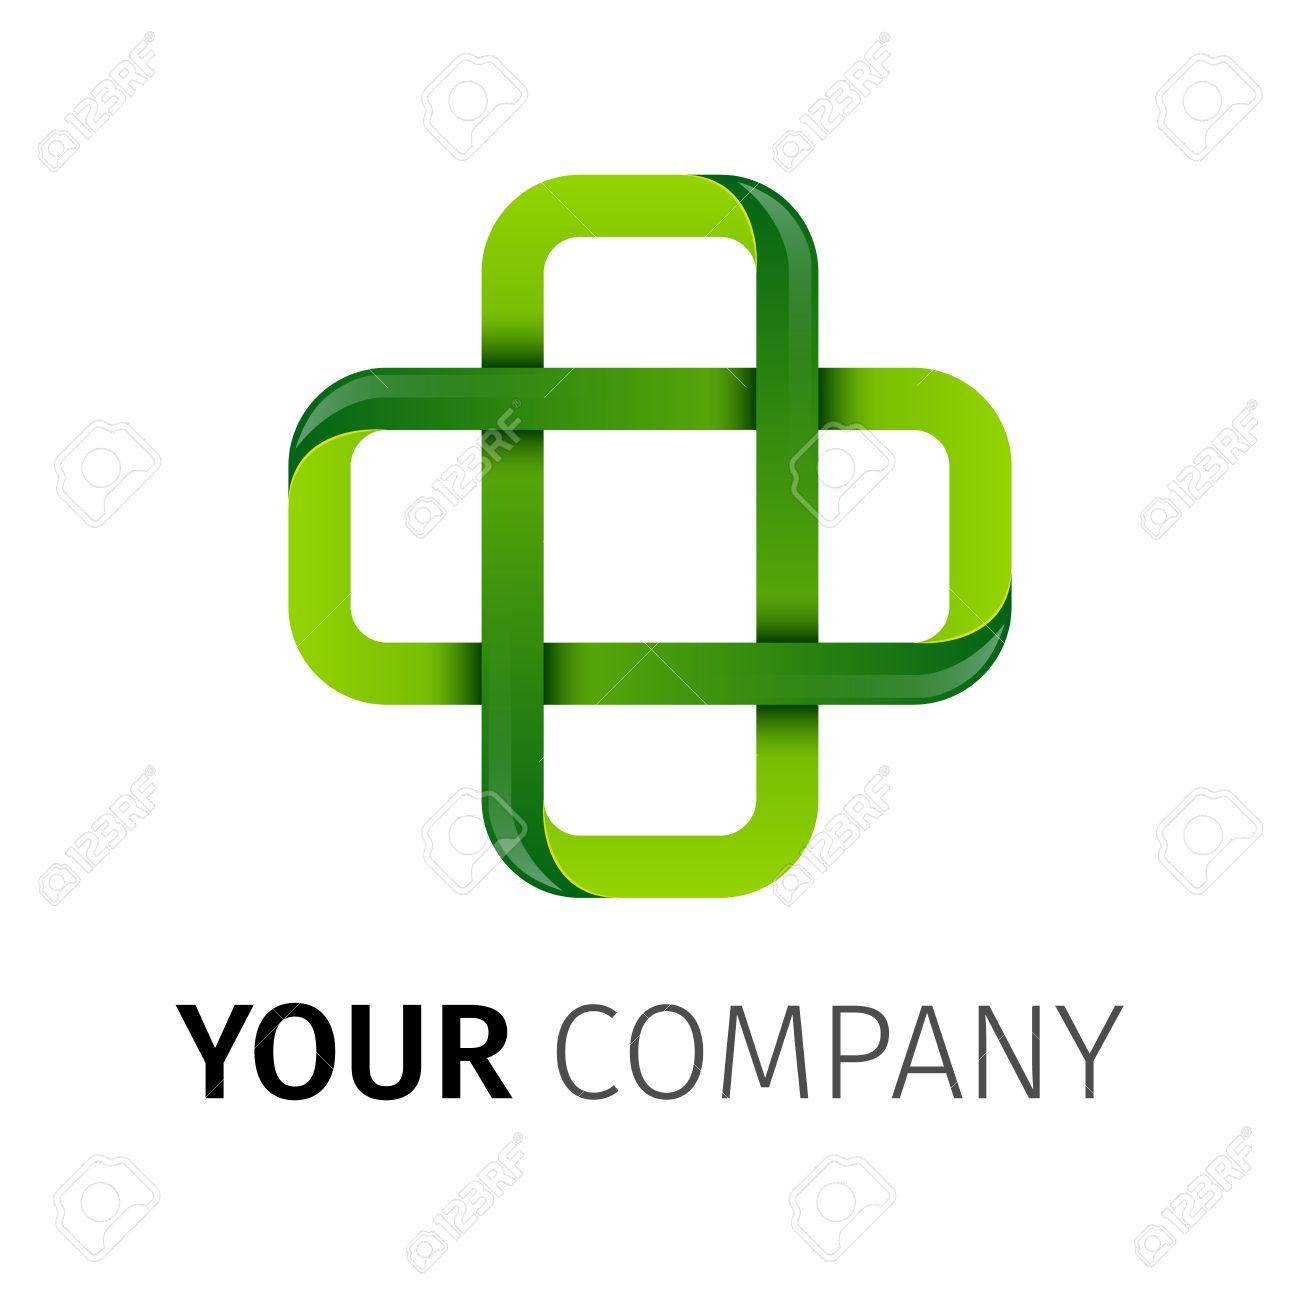 pharmacy green cross abstract vector logo design template medicine rh 123rf com pharmacist logo design pharmacy logo design samples